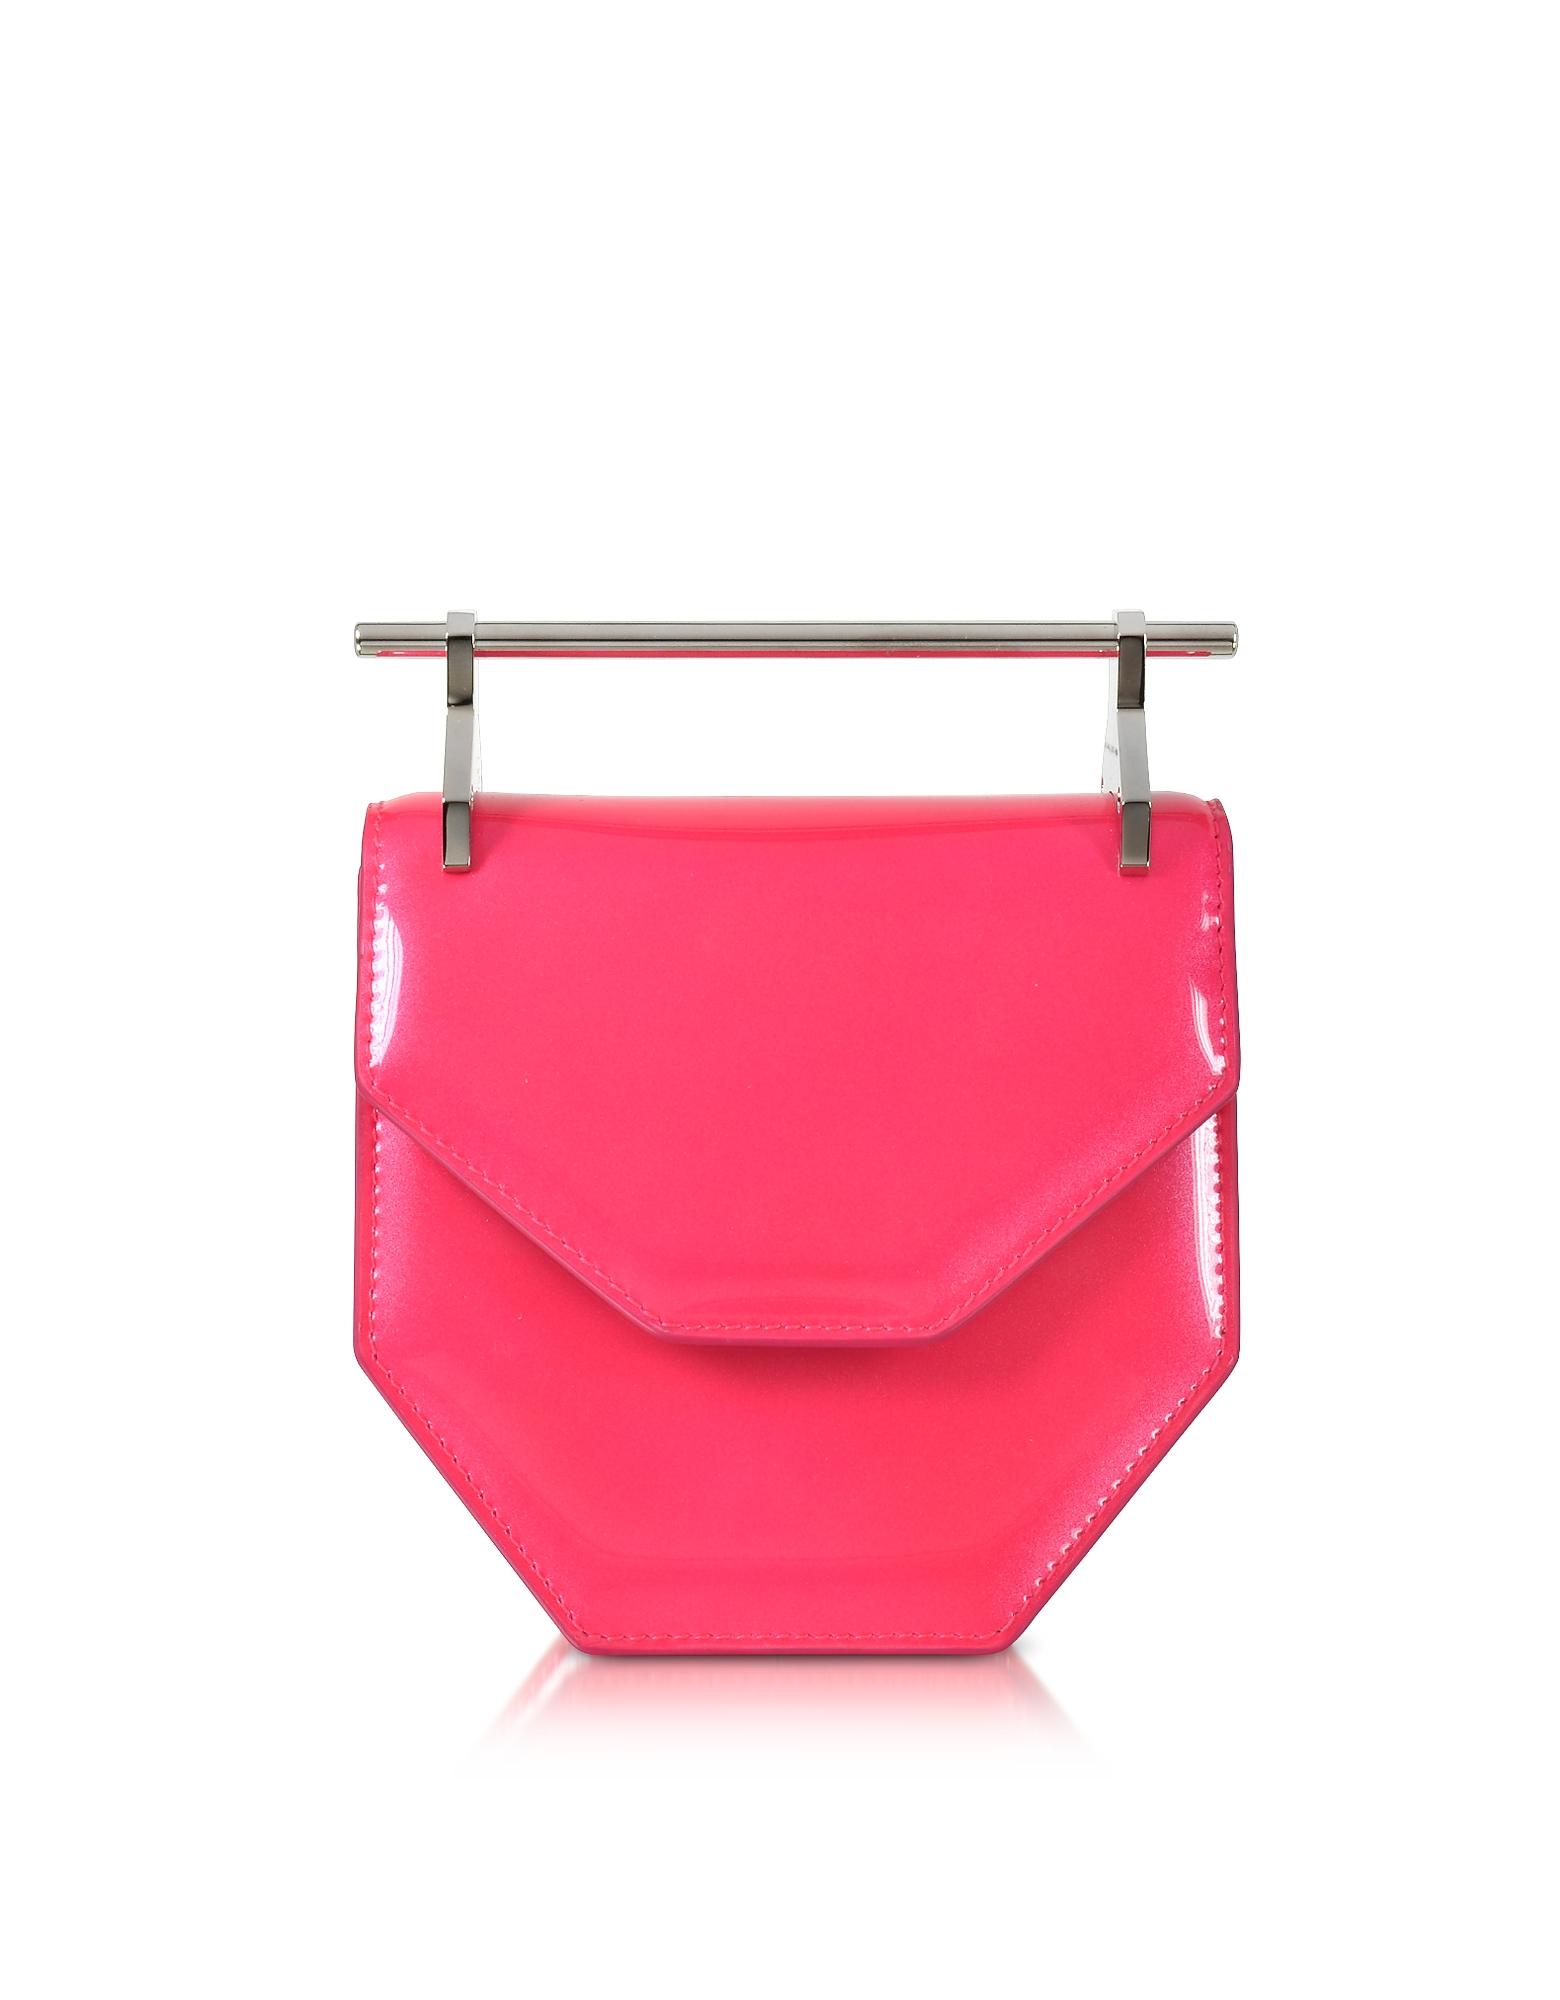 M2Malletier Handbags, Mini Amor Fati Neon Pink Leather Shoulder Bag